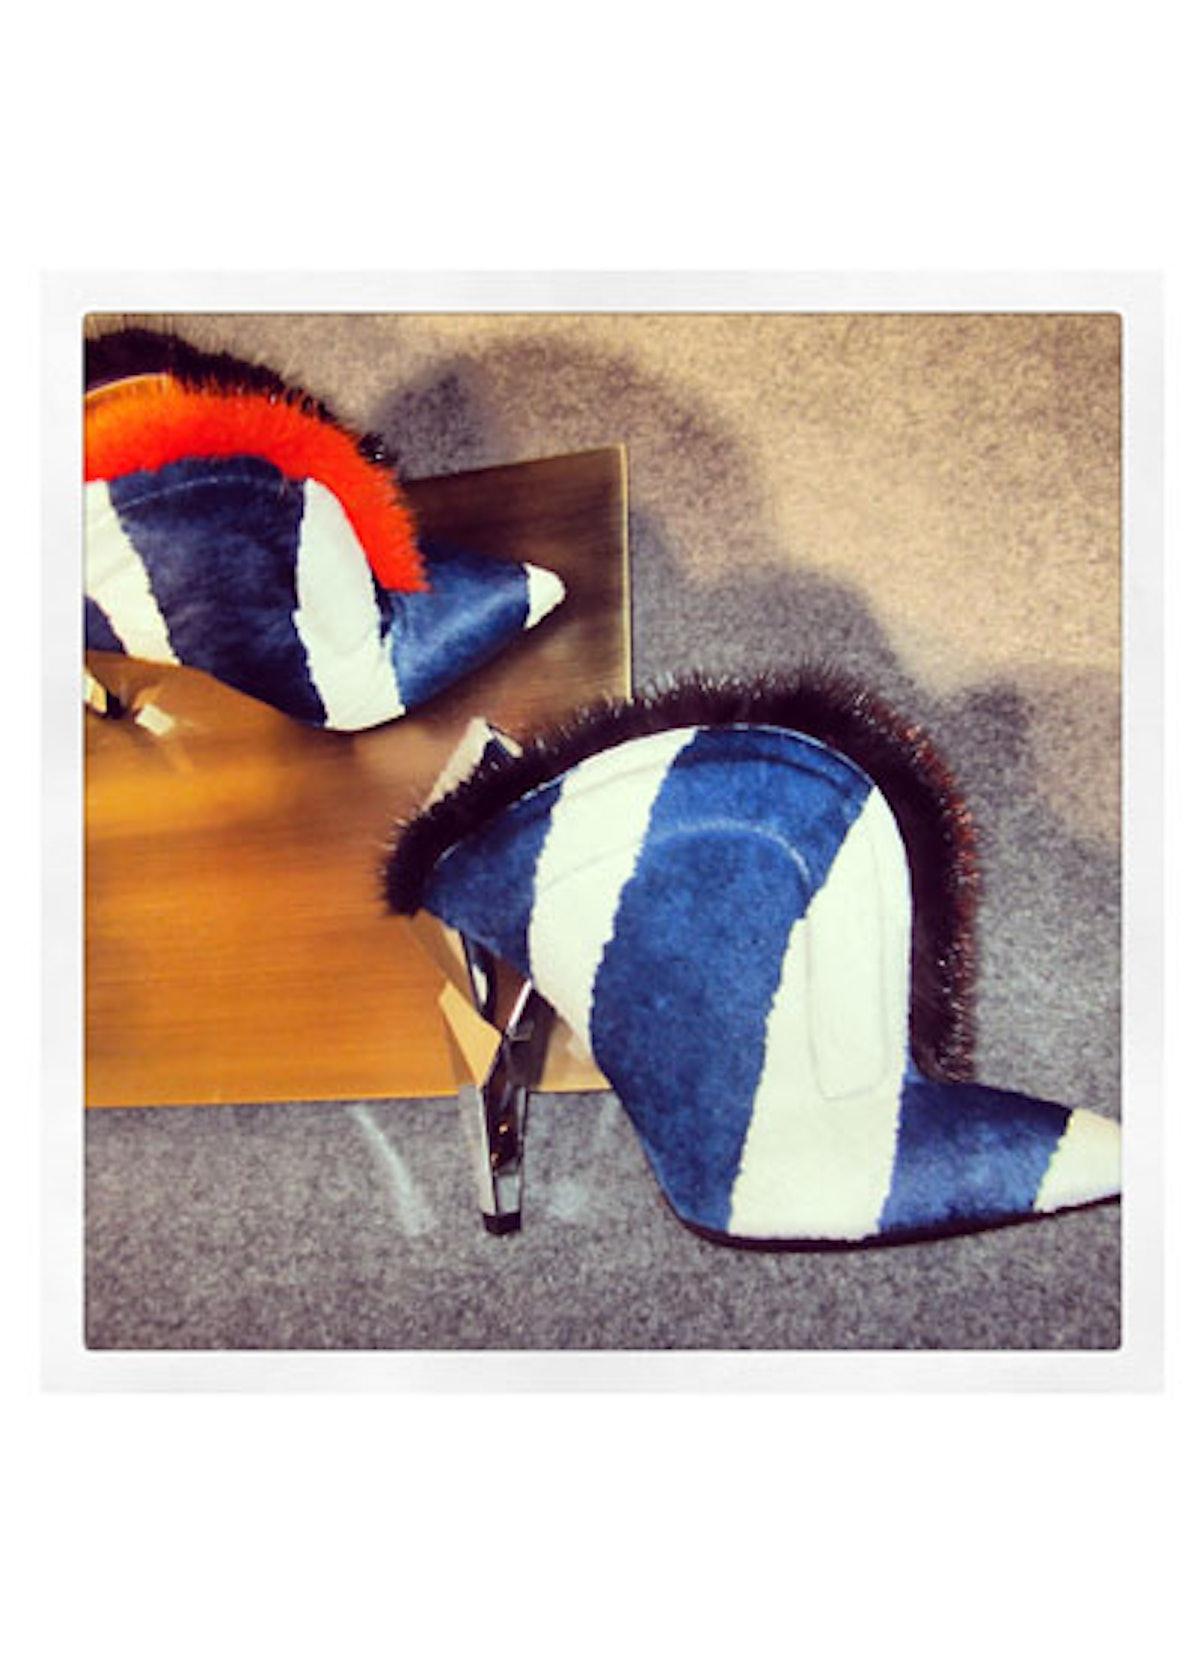 acss-best-shoes-fall-2013-07-v.jpg